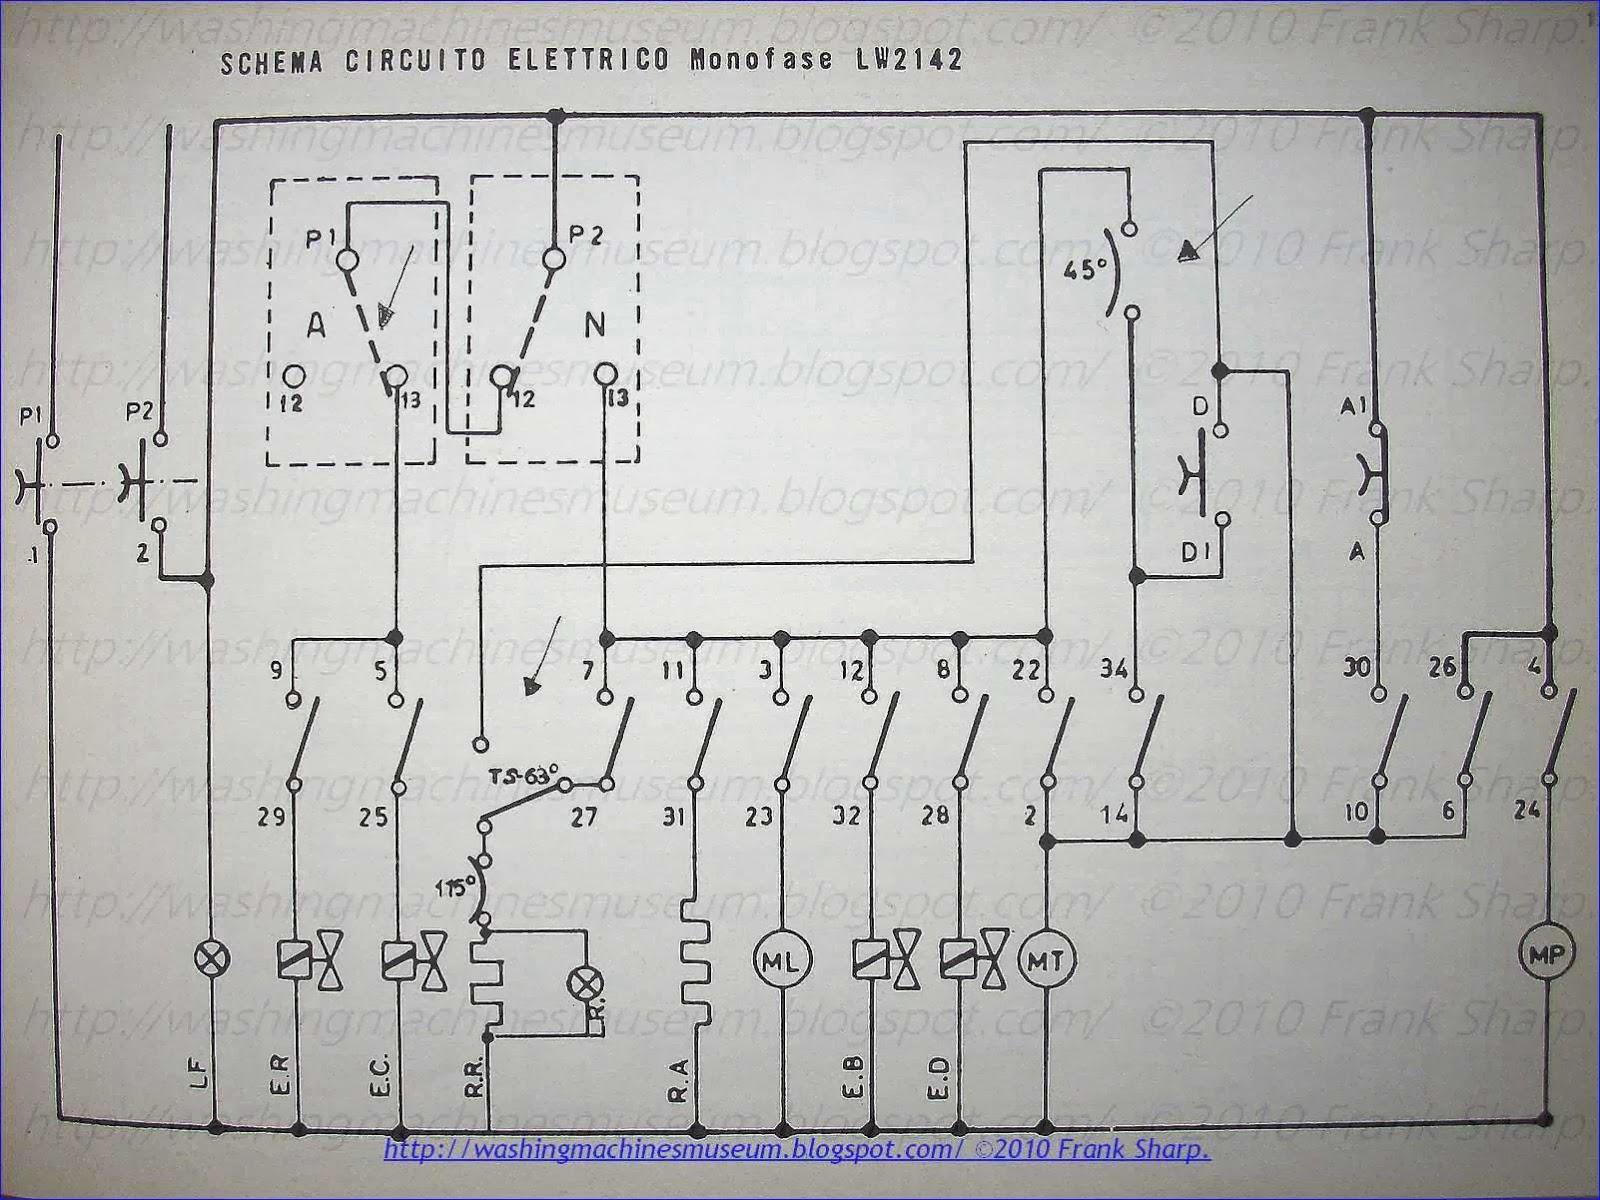 medium resolution of wrg 4272 philco refrigerator wiring diagram philco lw2142 lw2142 a lw2142 b schematic diagram